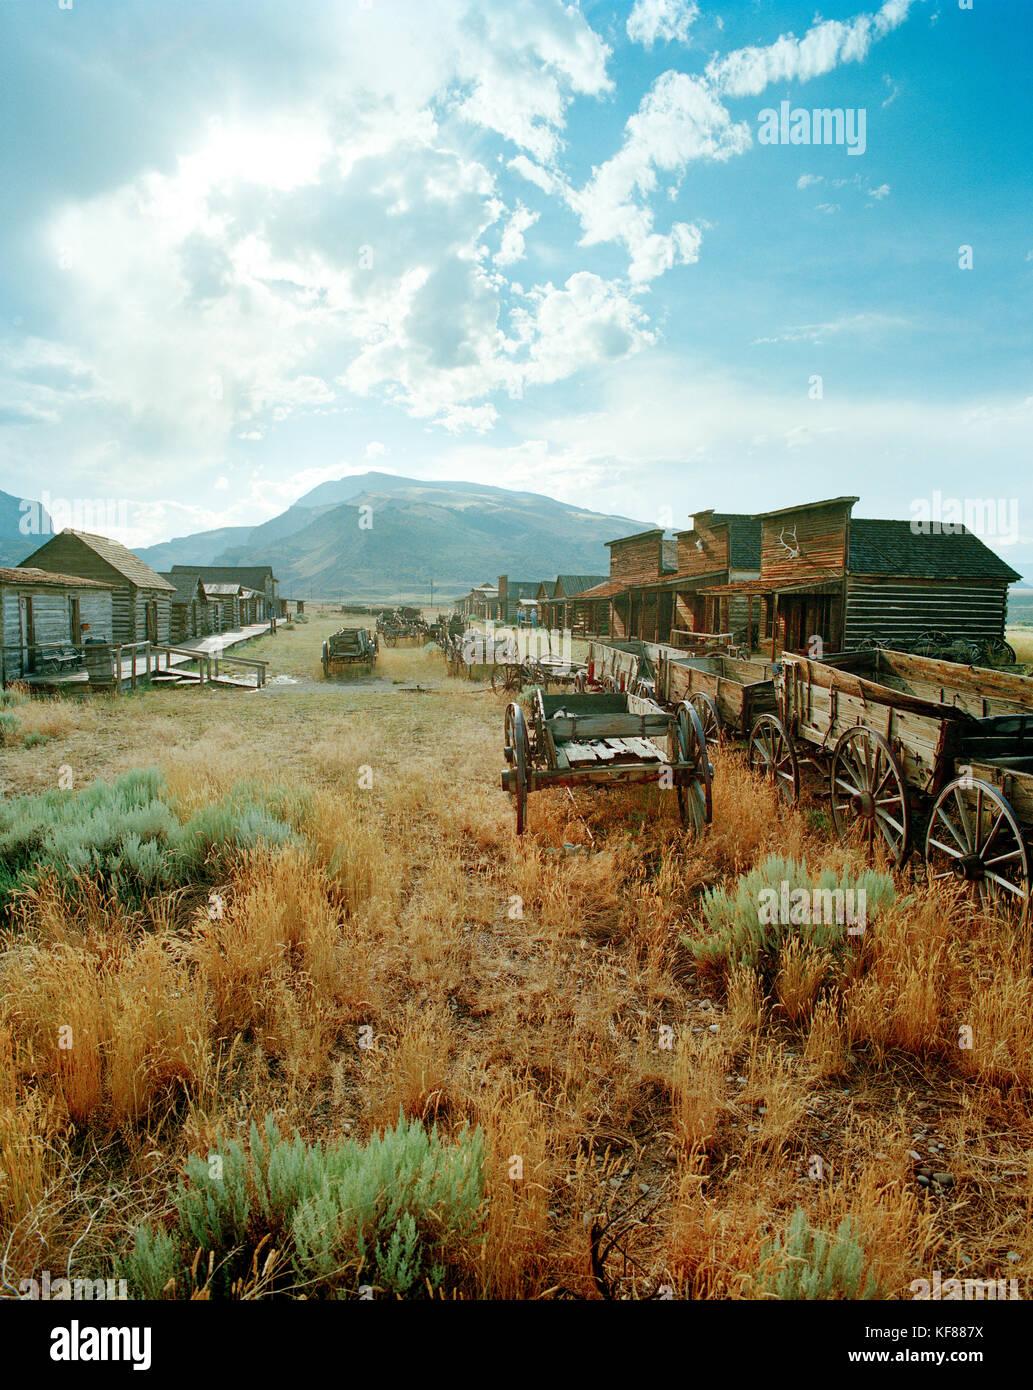 USA, Wyoming, Codyk, Old Trail Town - Stock Image